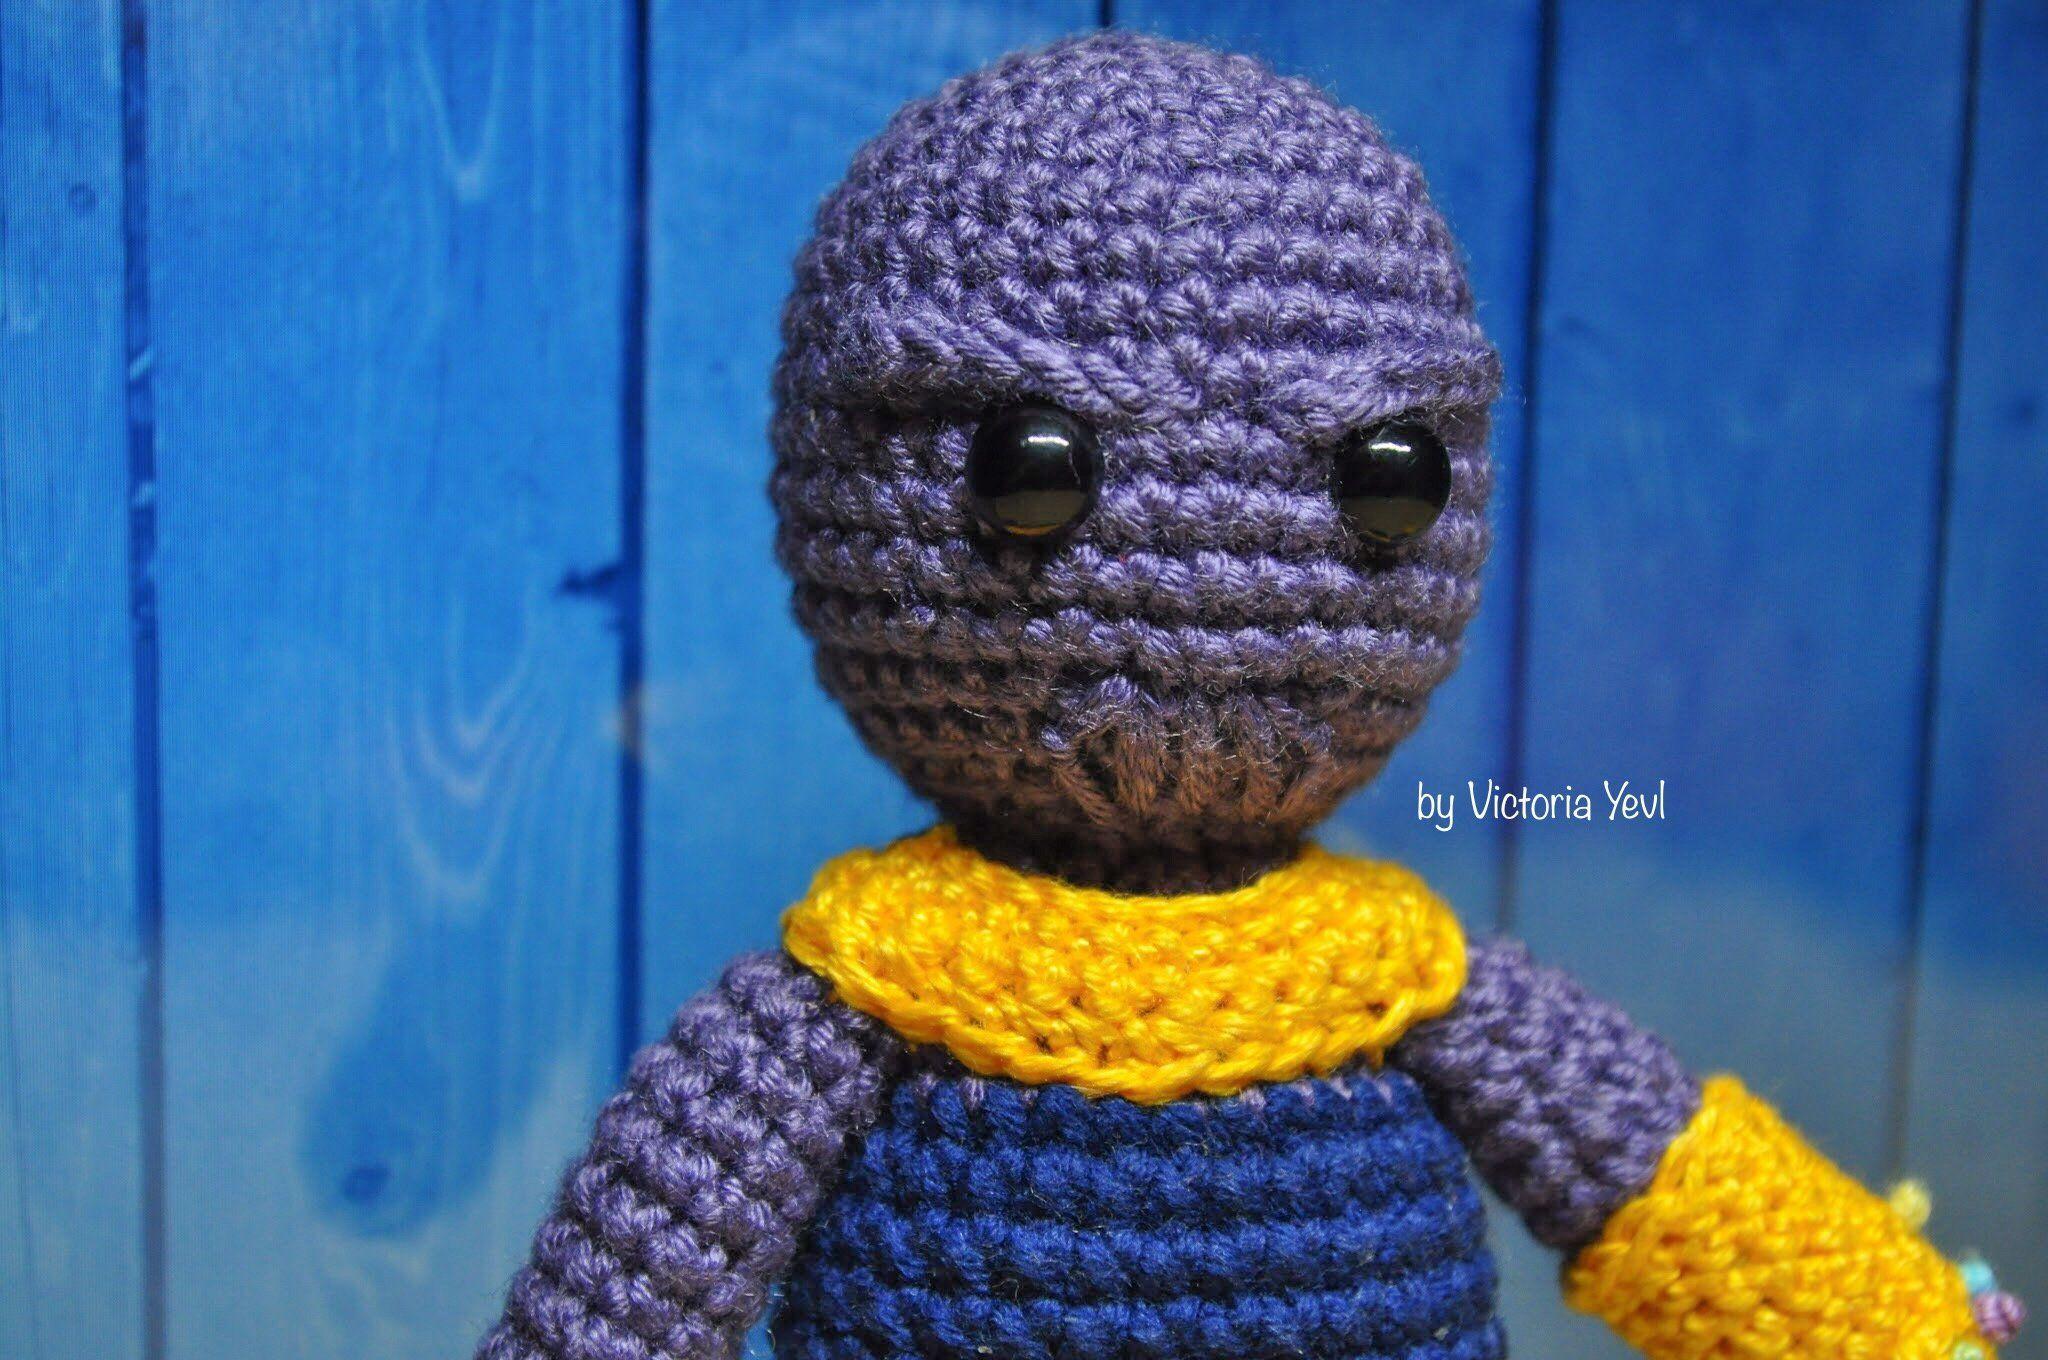 Thanos crochet amigurumi toy - avengers infinity war, end